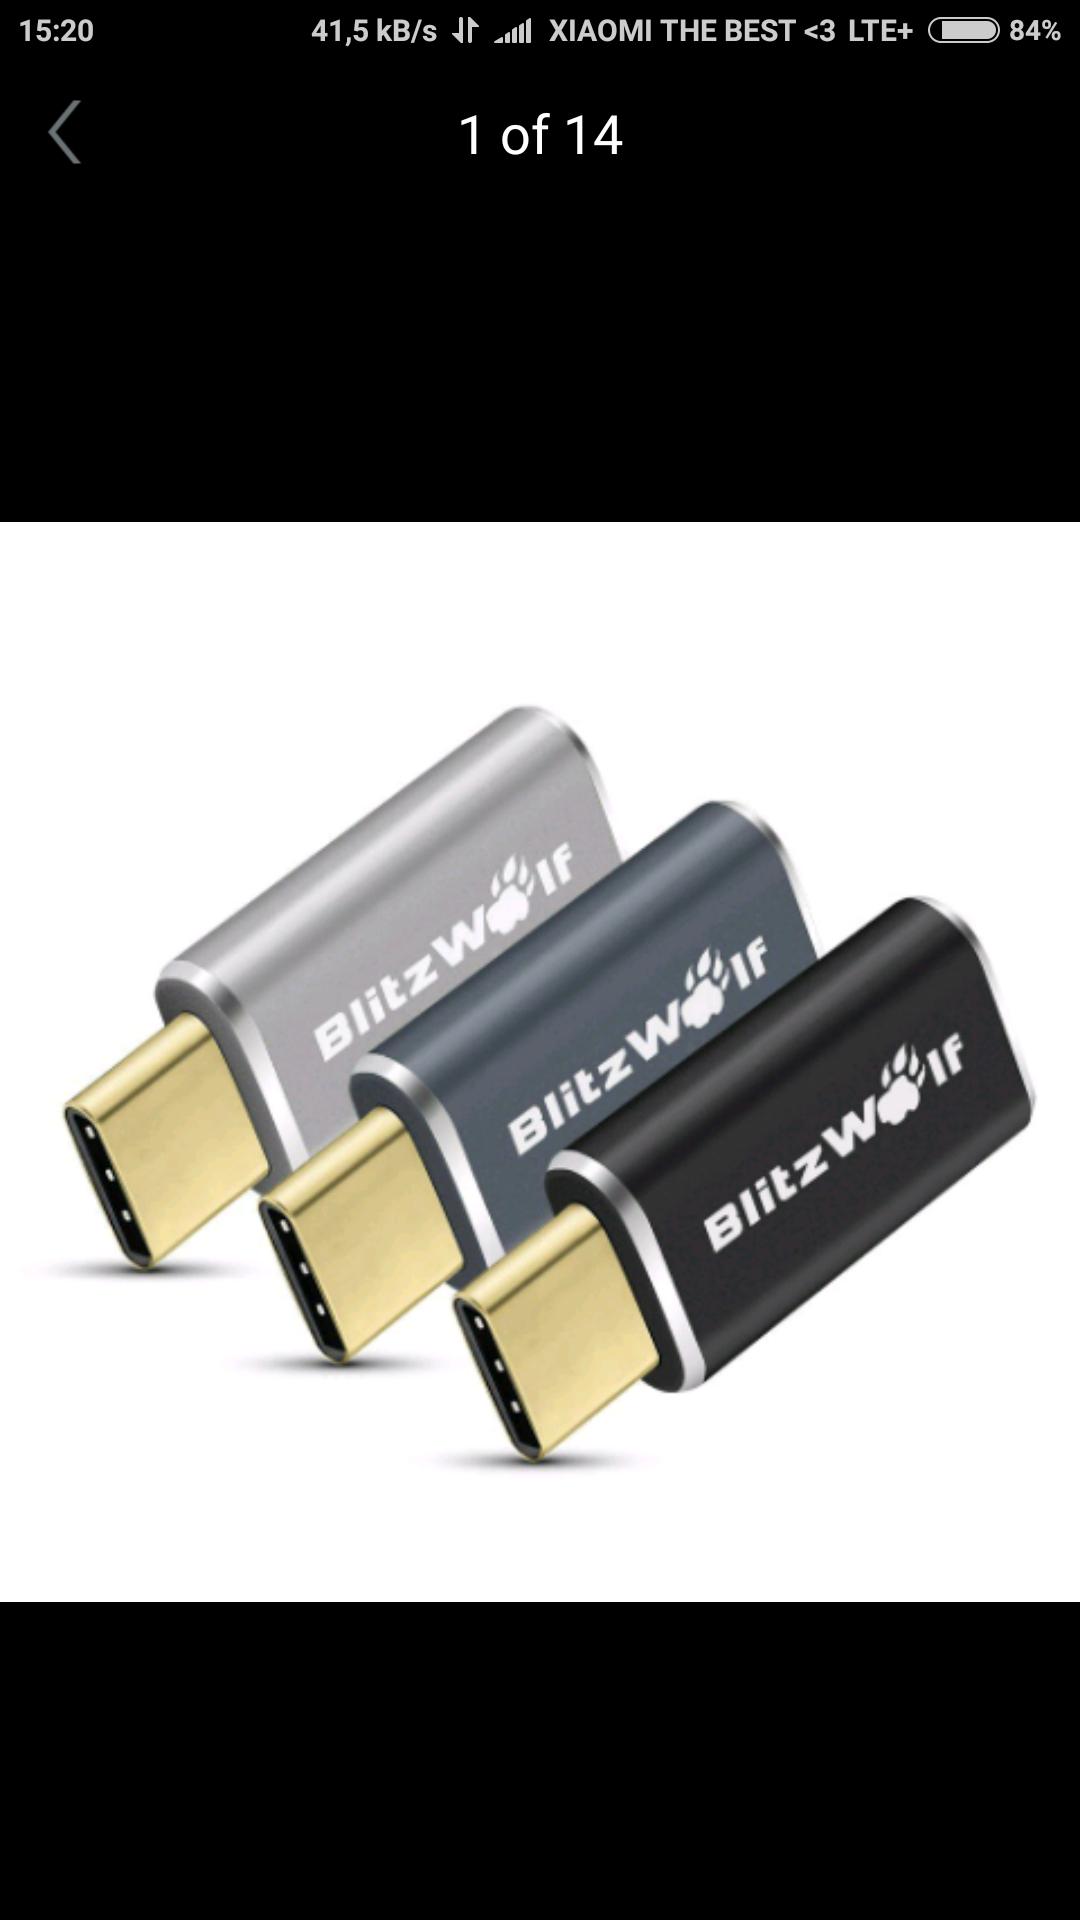 Przejściówka Blitzwolf microusb --> USB type C @banggood